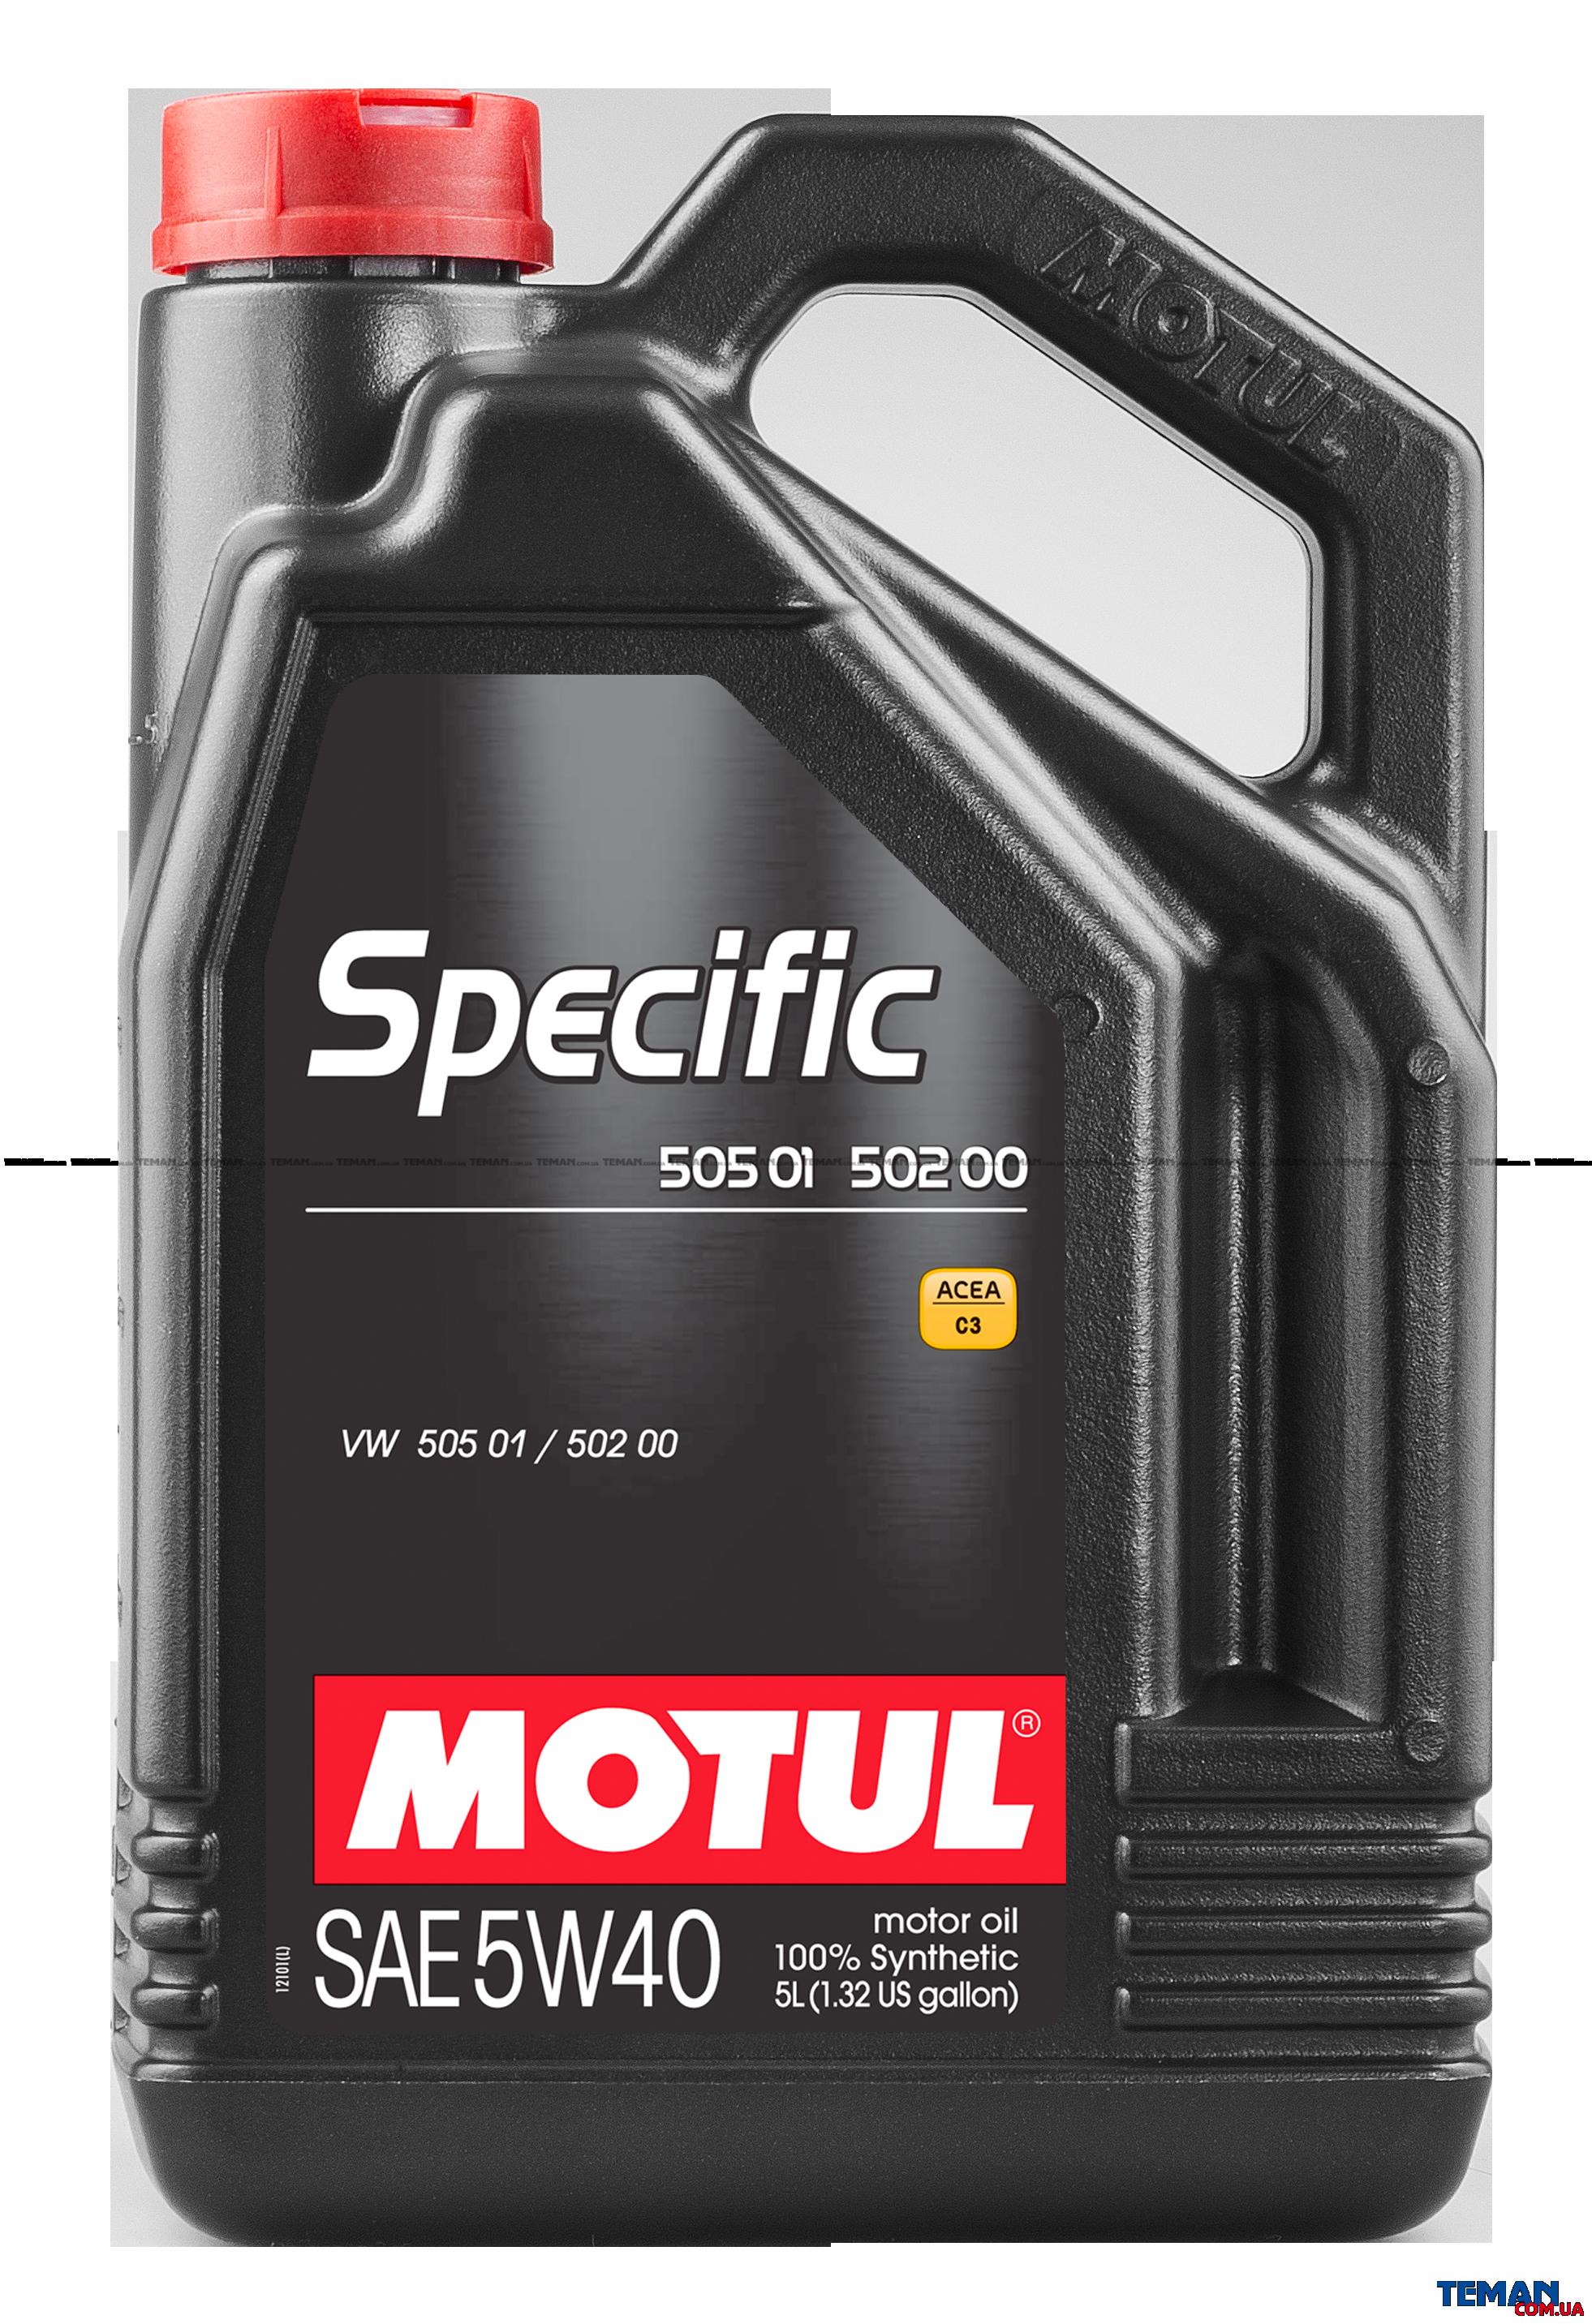 Синтетическое моторное масло SPECIFIC 505 01 - 502 00, 5W-40, 5 л